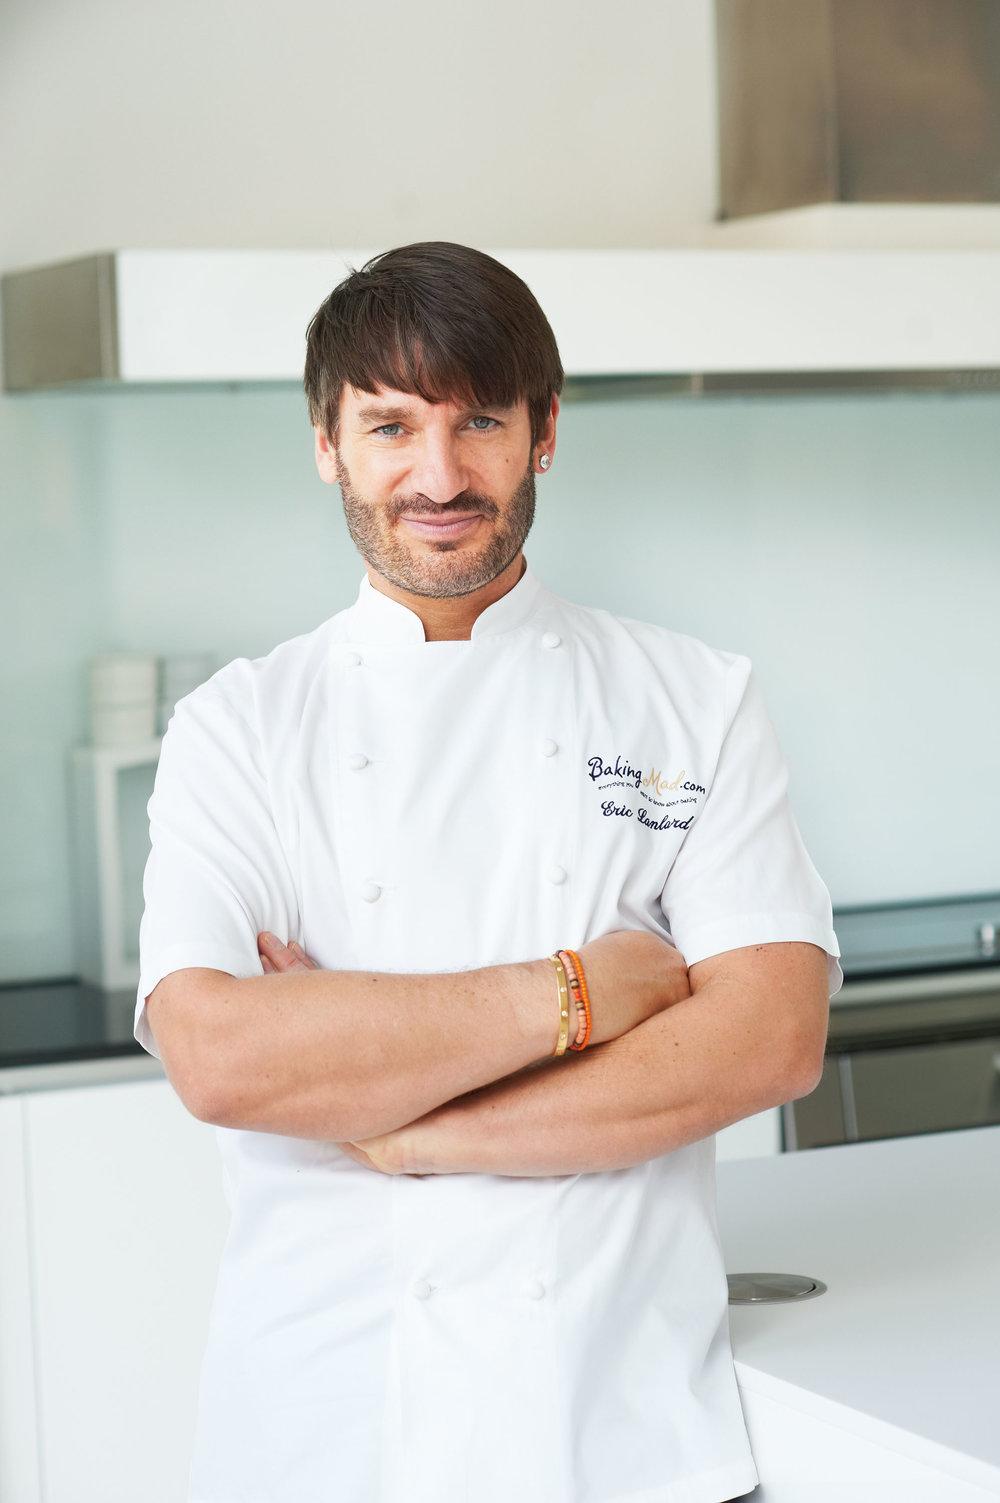 French Master Pattisier Éric Lanlard